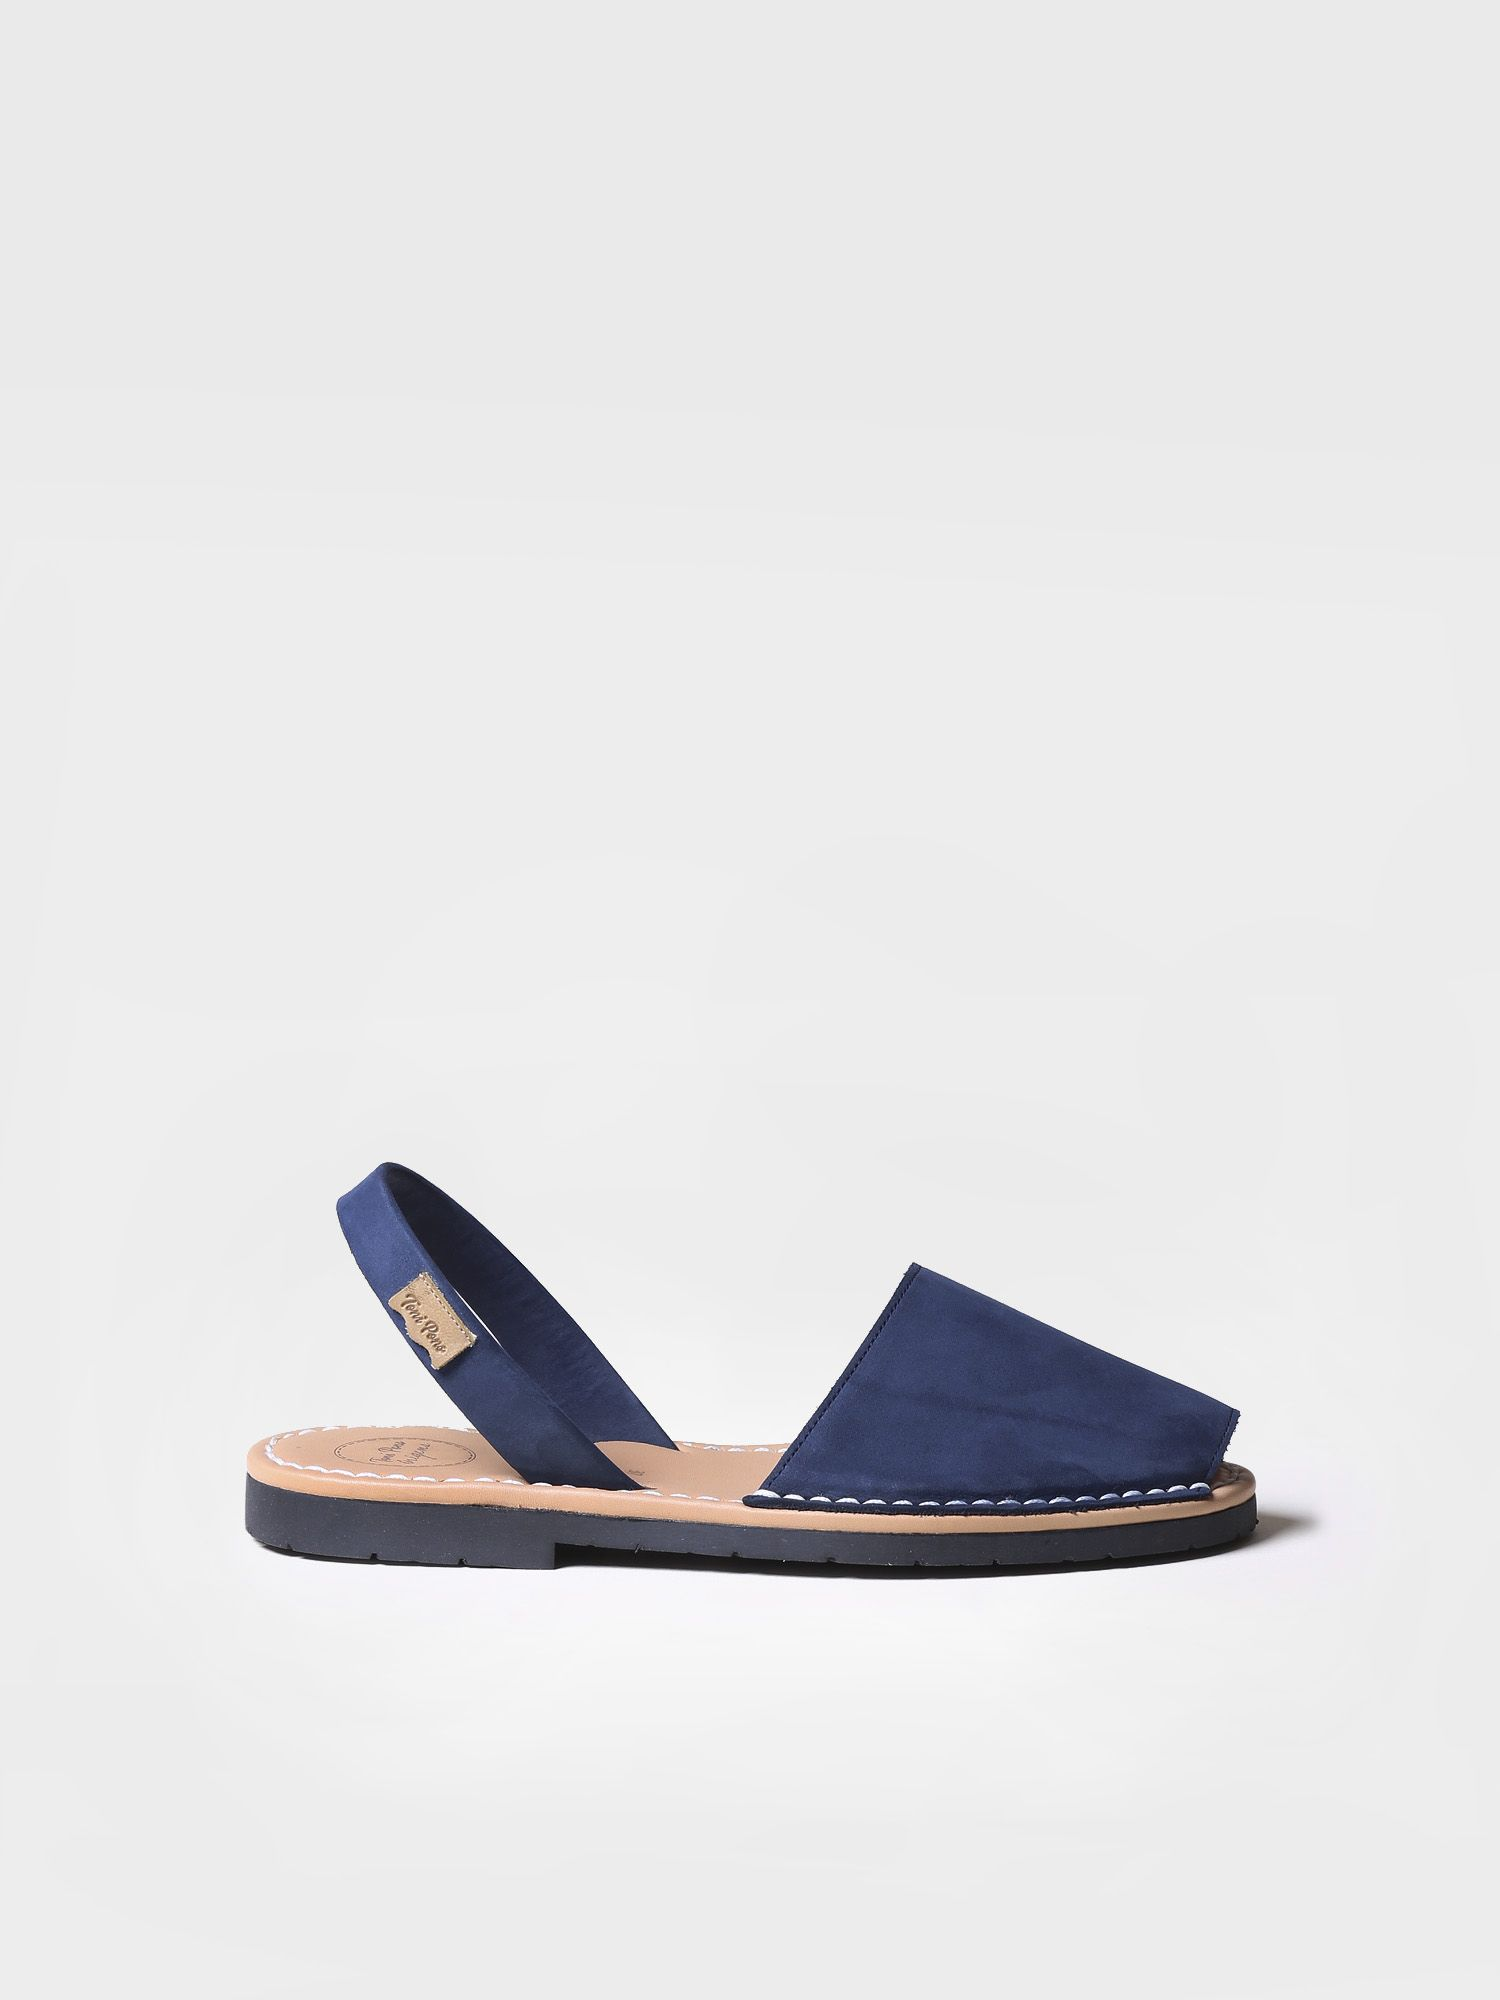 Nobuck leather avarca sandals - MAO-N